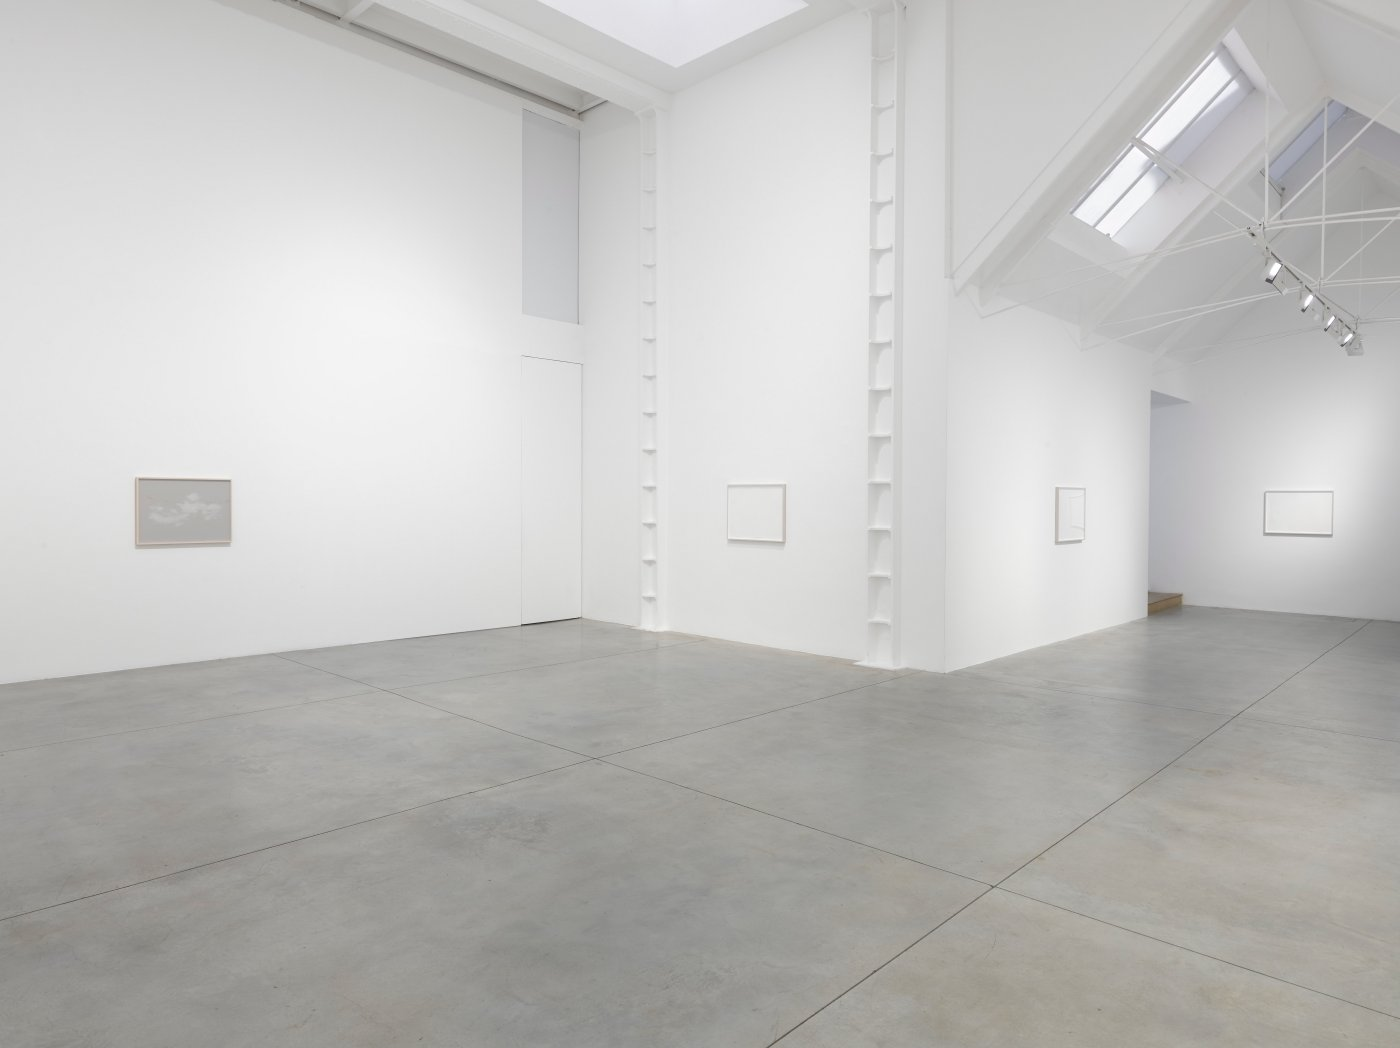 Lisson Gallery Bell Street Spencer Finch 4